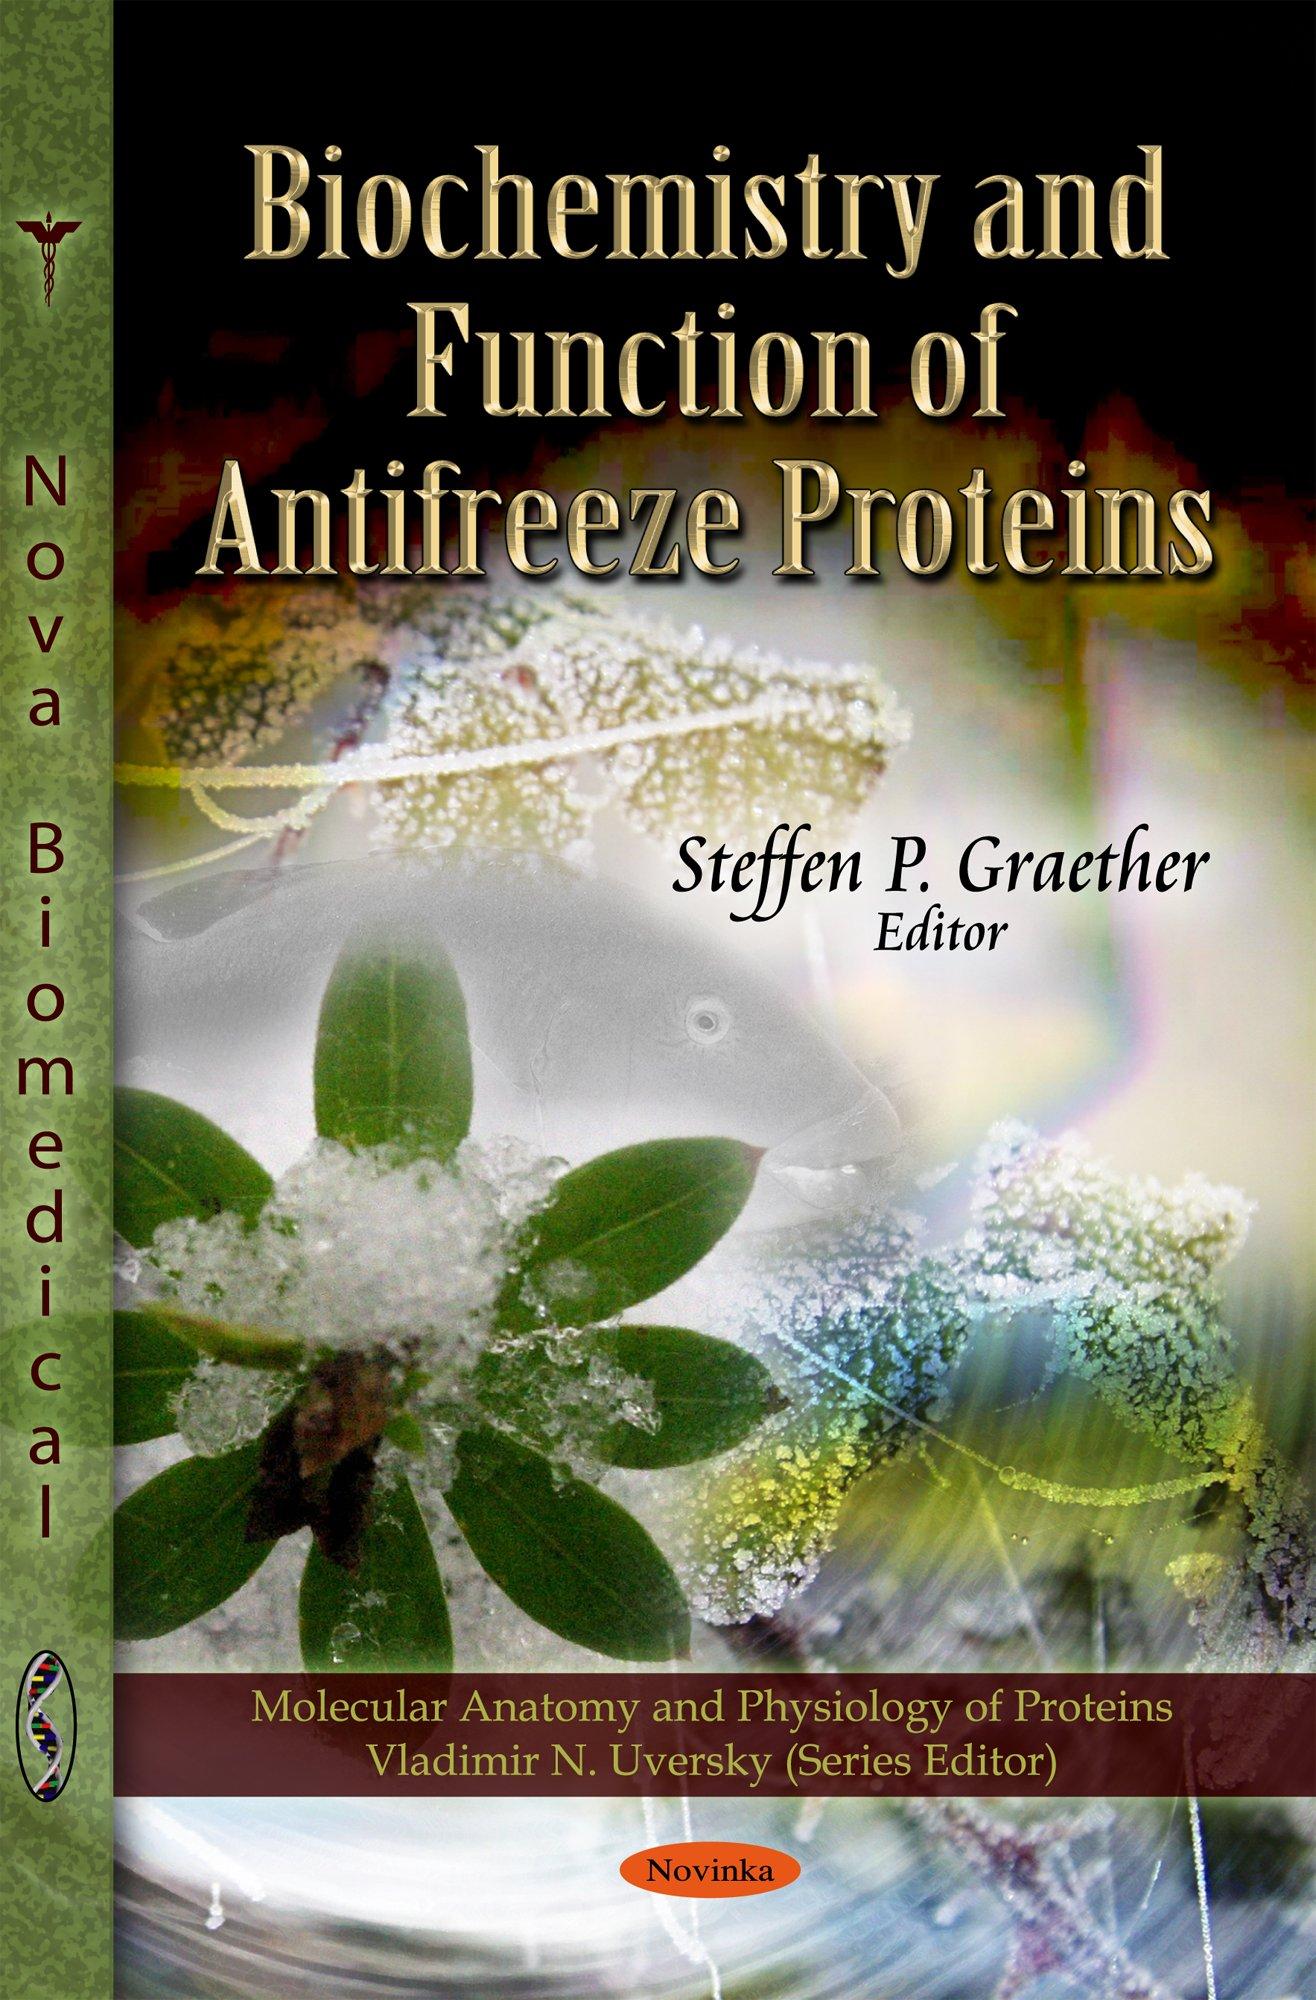 Biochemistry & Function of Antifreeze Proteins Molecular ...